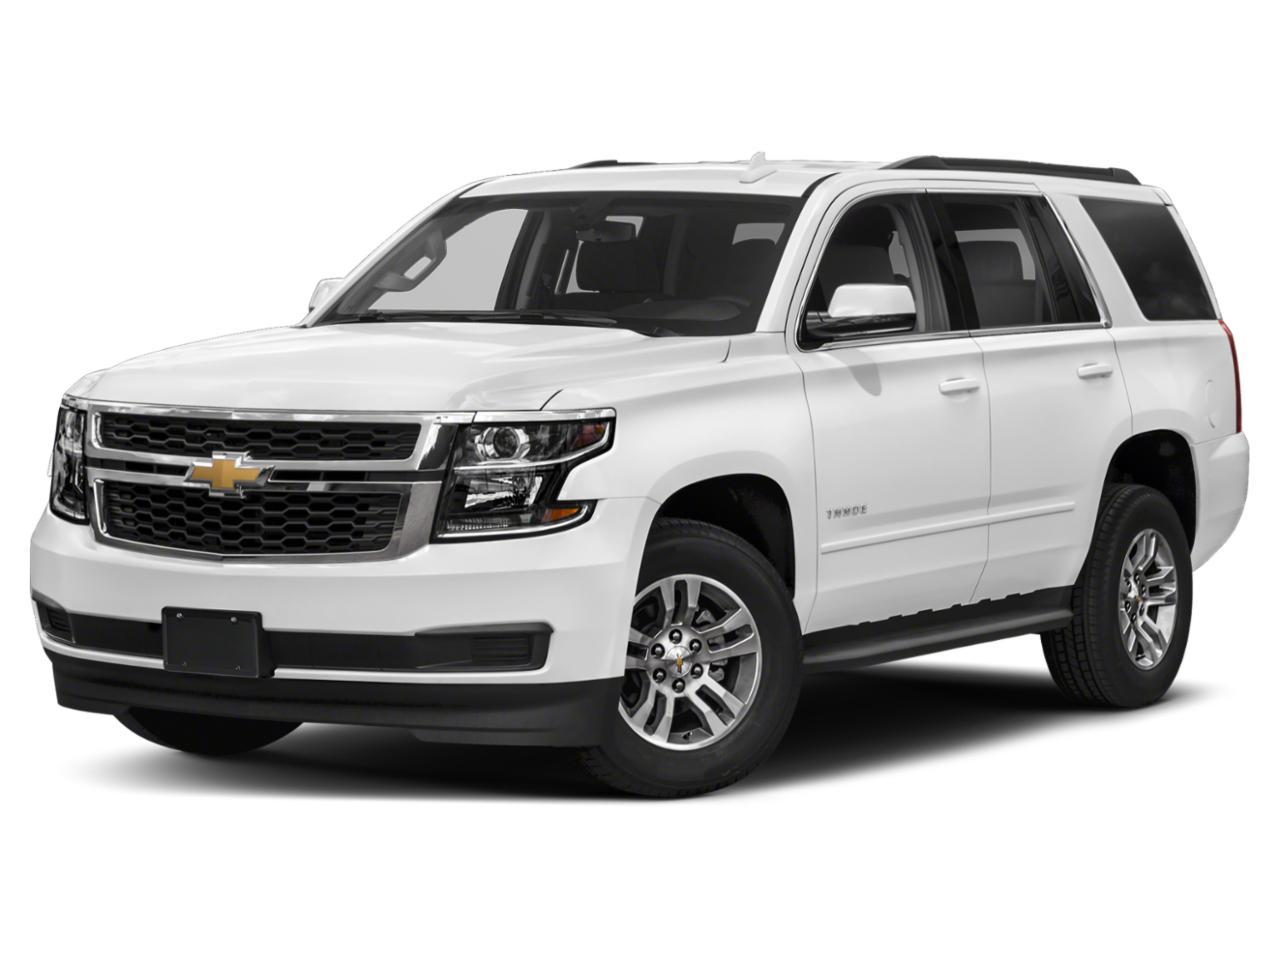 Summit White 2019 Chevrolet Tahoe LT SUV Wake Forest NC